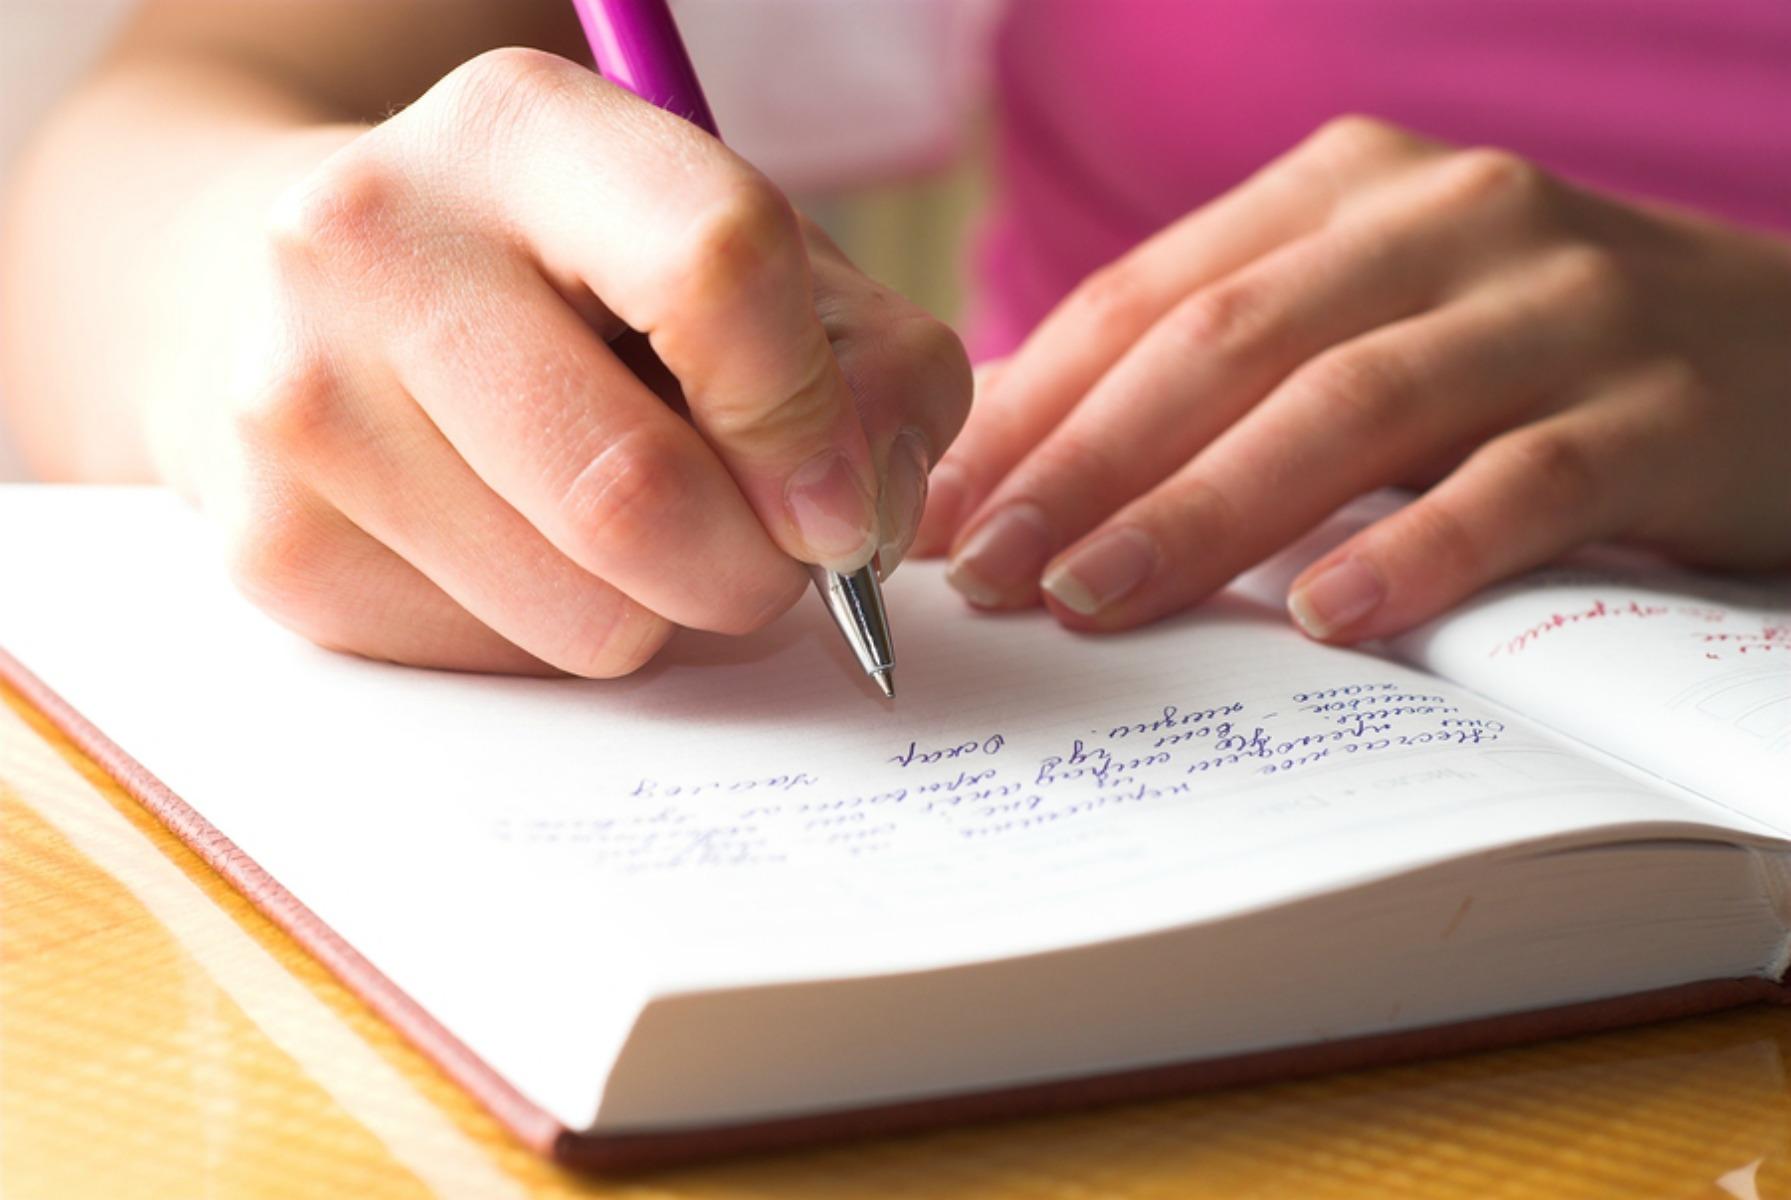 Homecare in New York City NY: Having a Journal